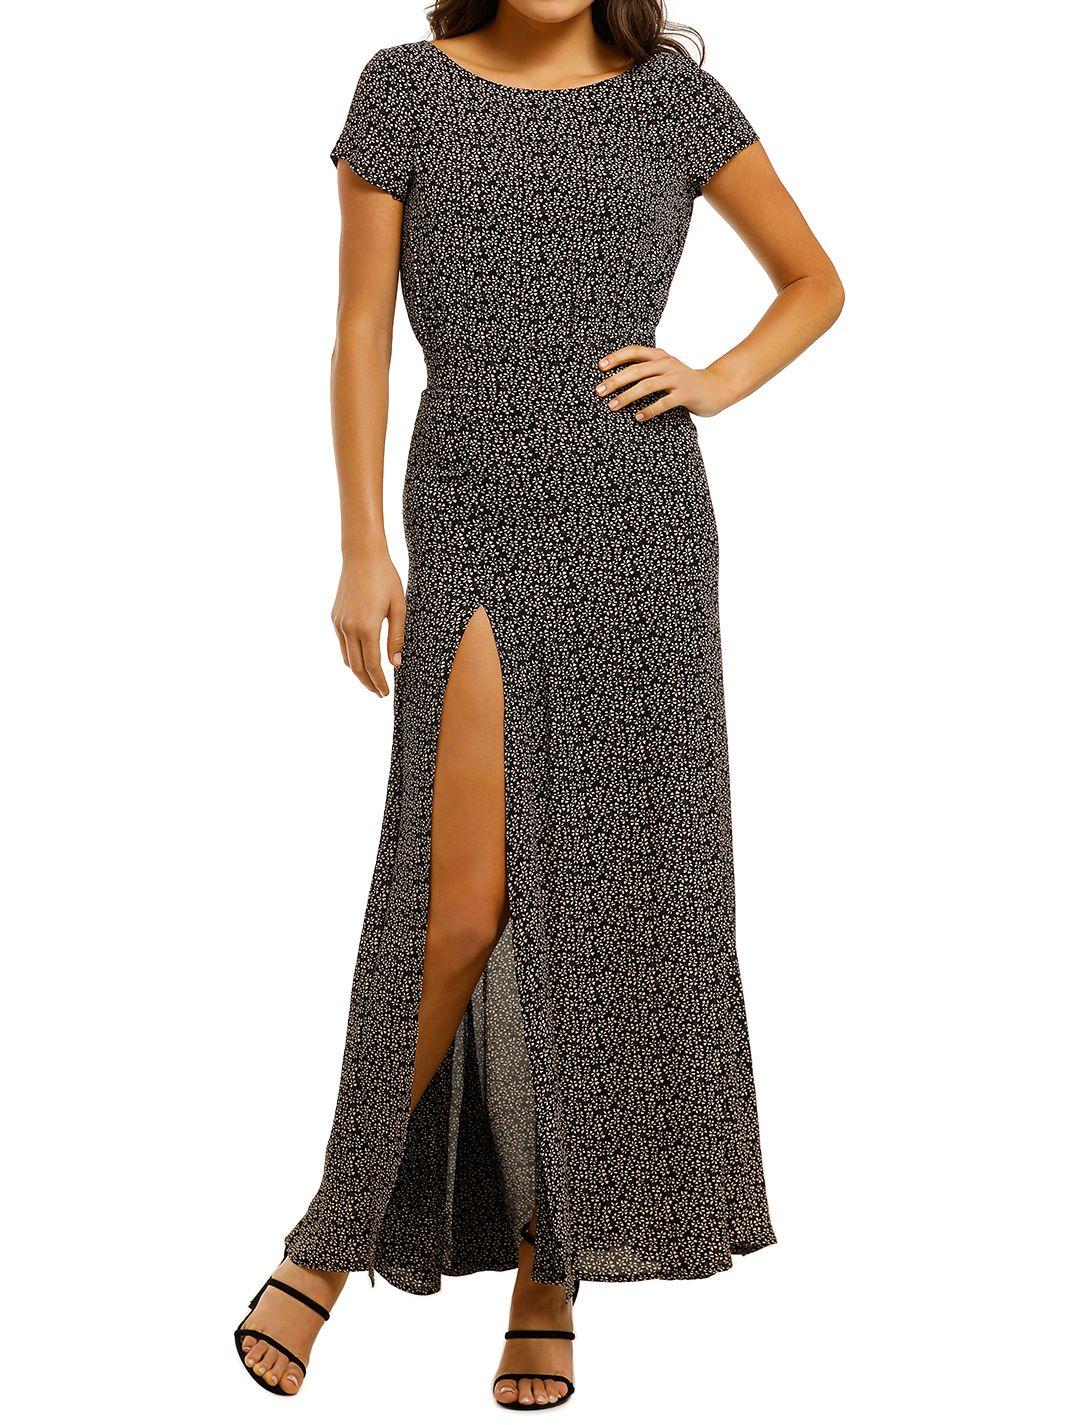 Flynn-Skye-Dawn-Dress-Blush-Petals-Front